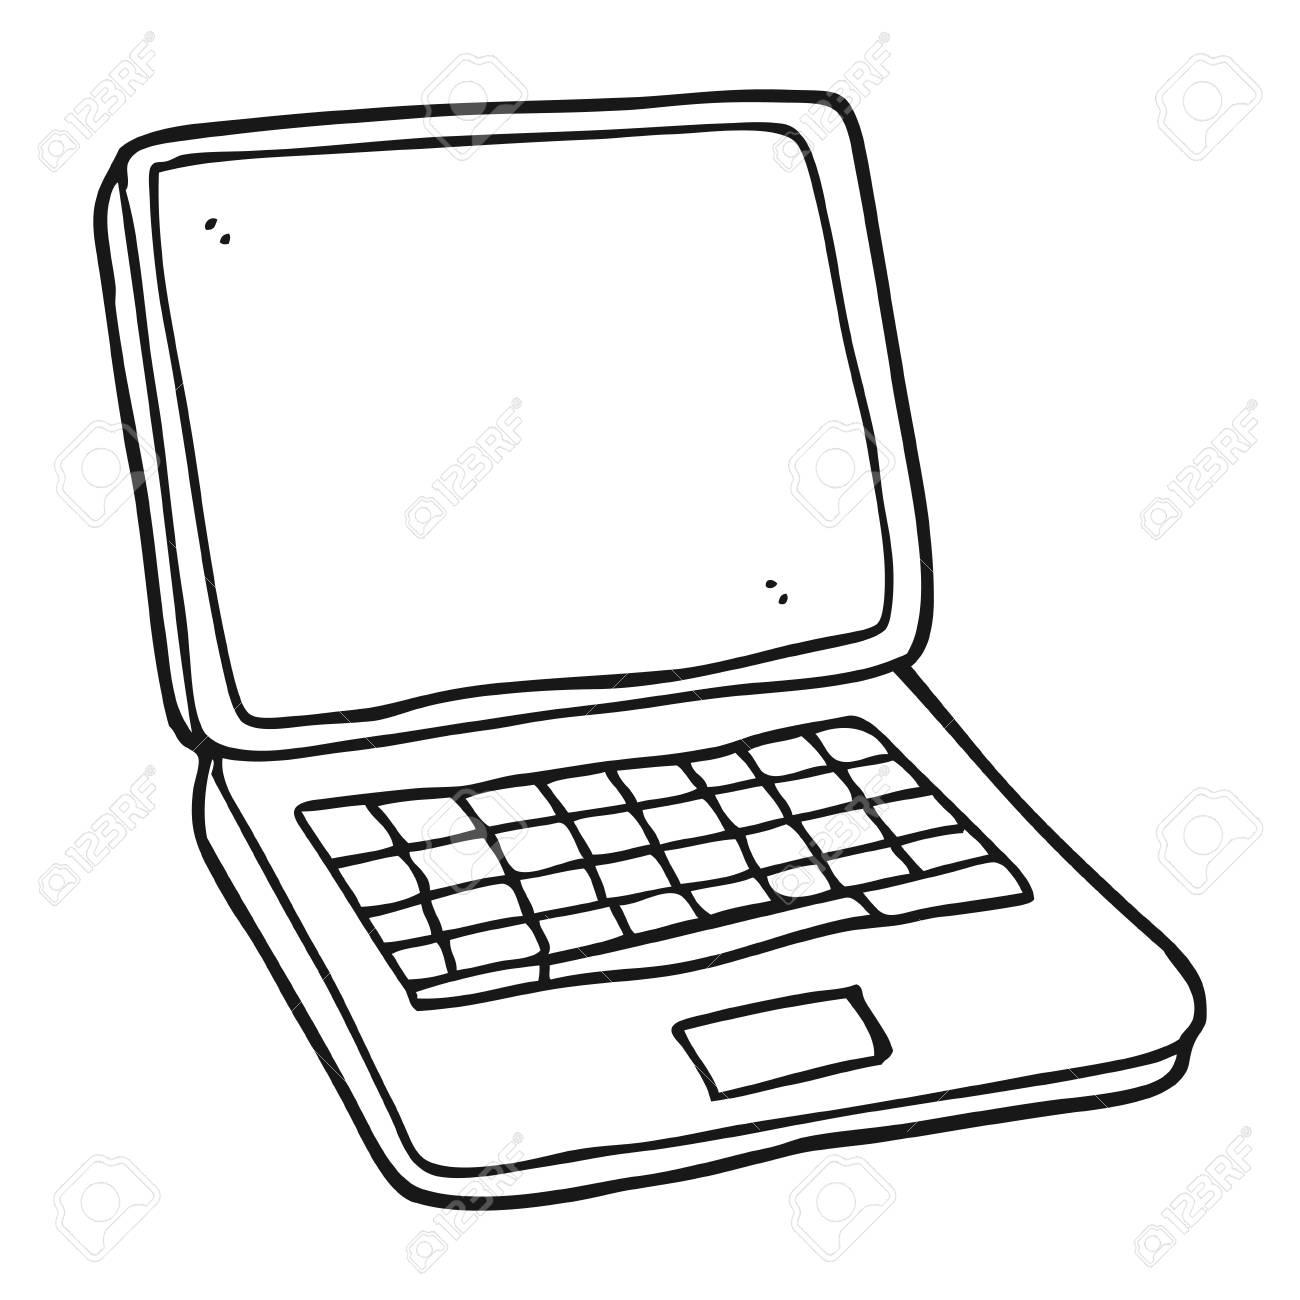 Dibujado A Mano Alzada De La Computadora Portátil De Dibujos ...